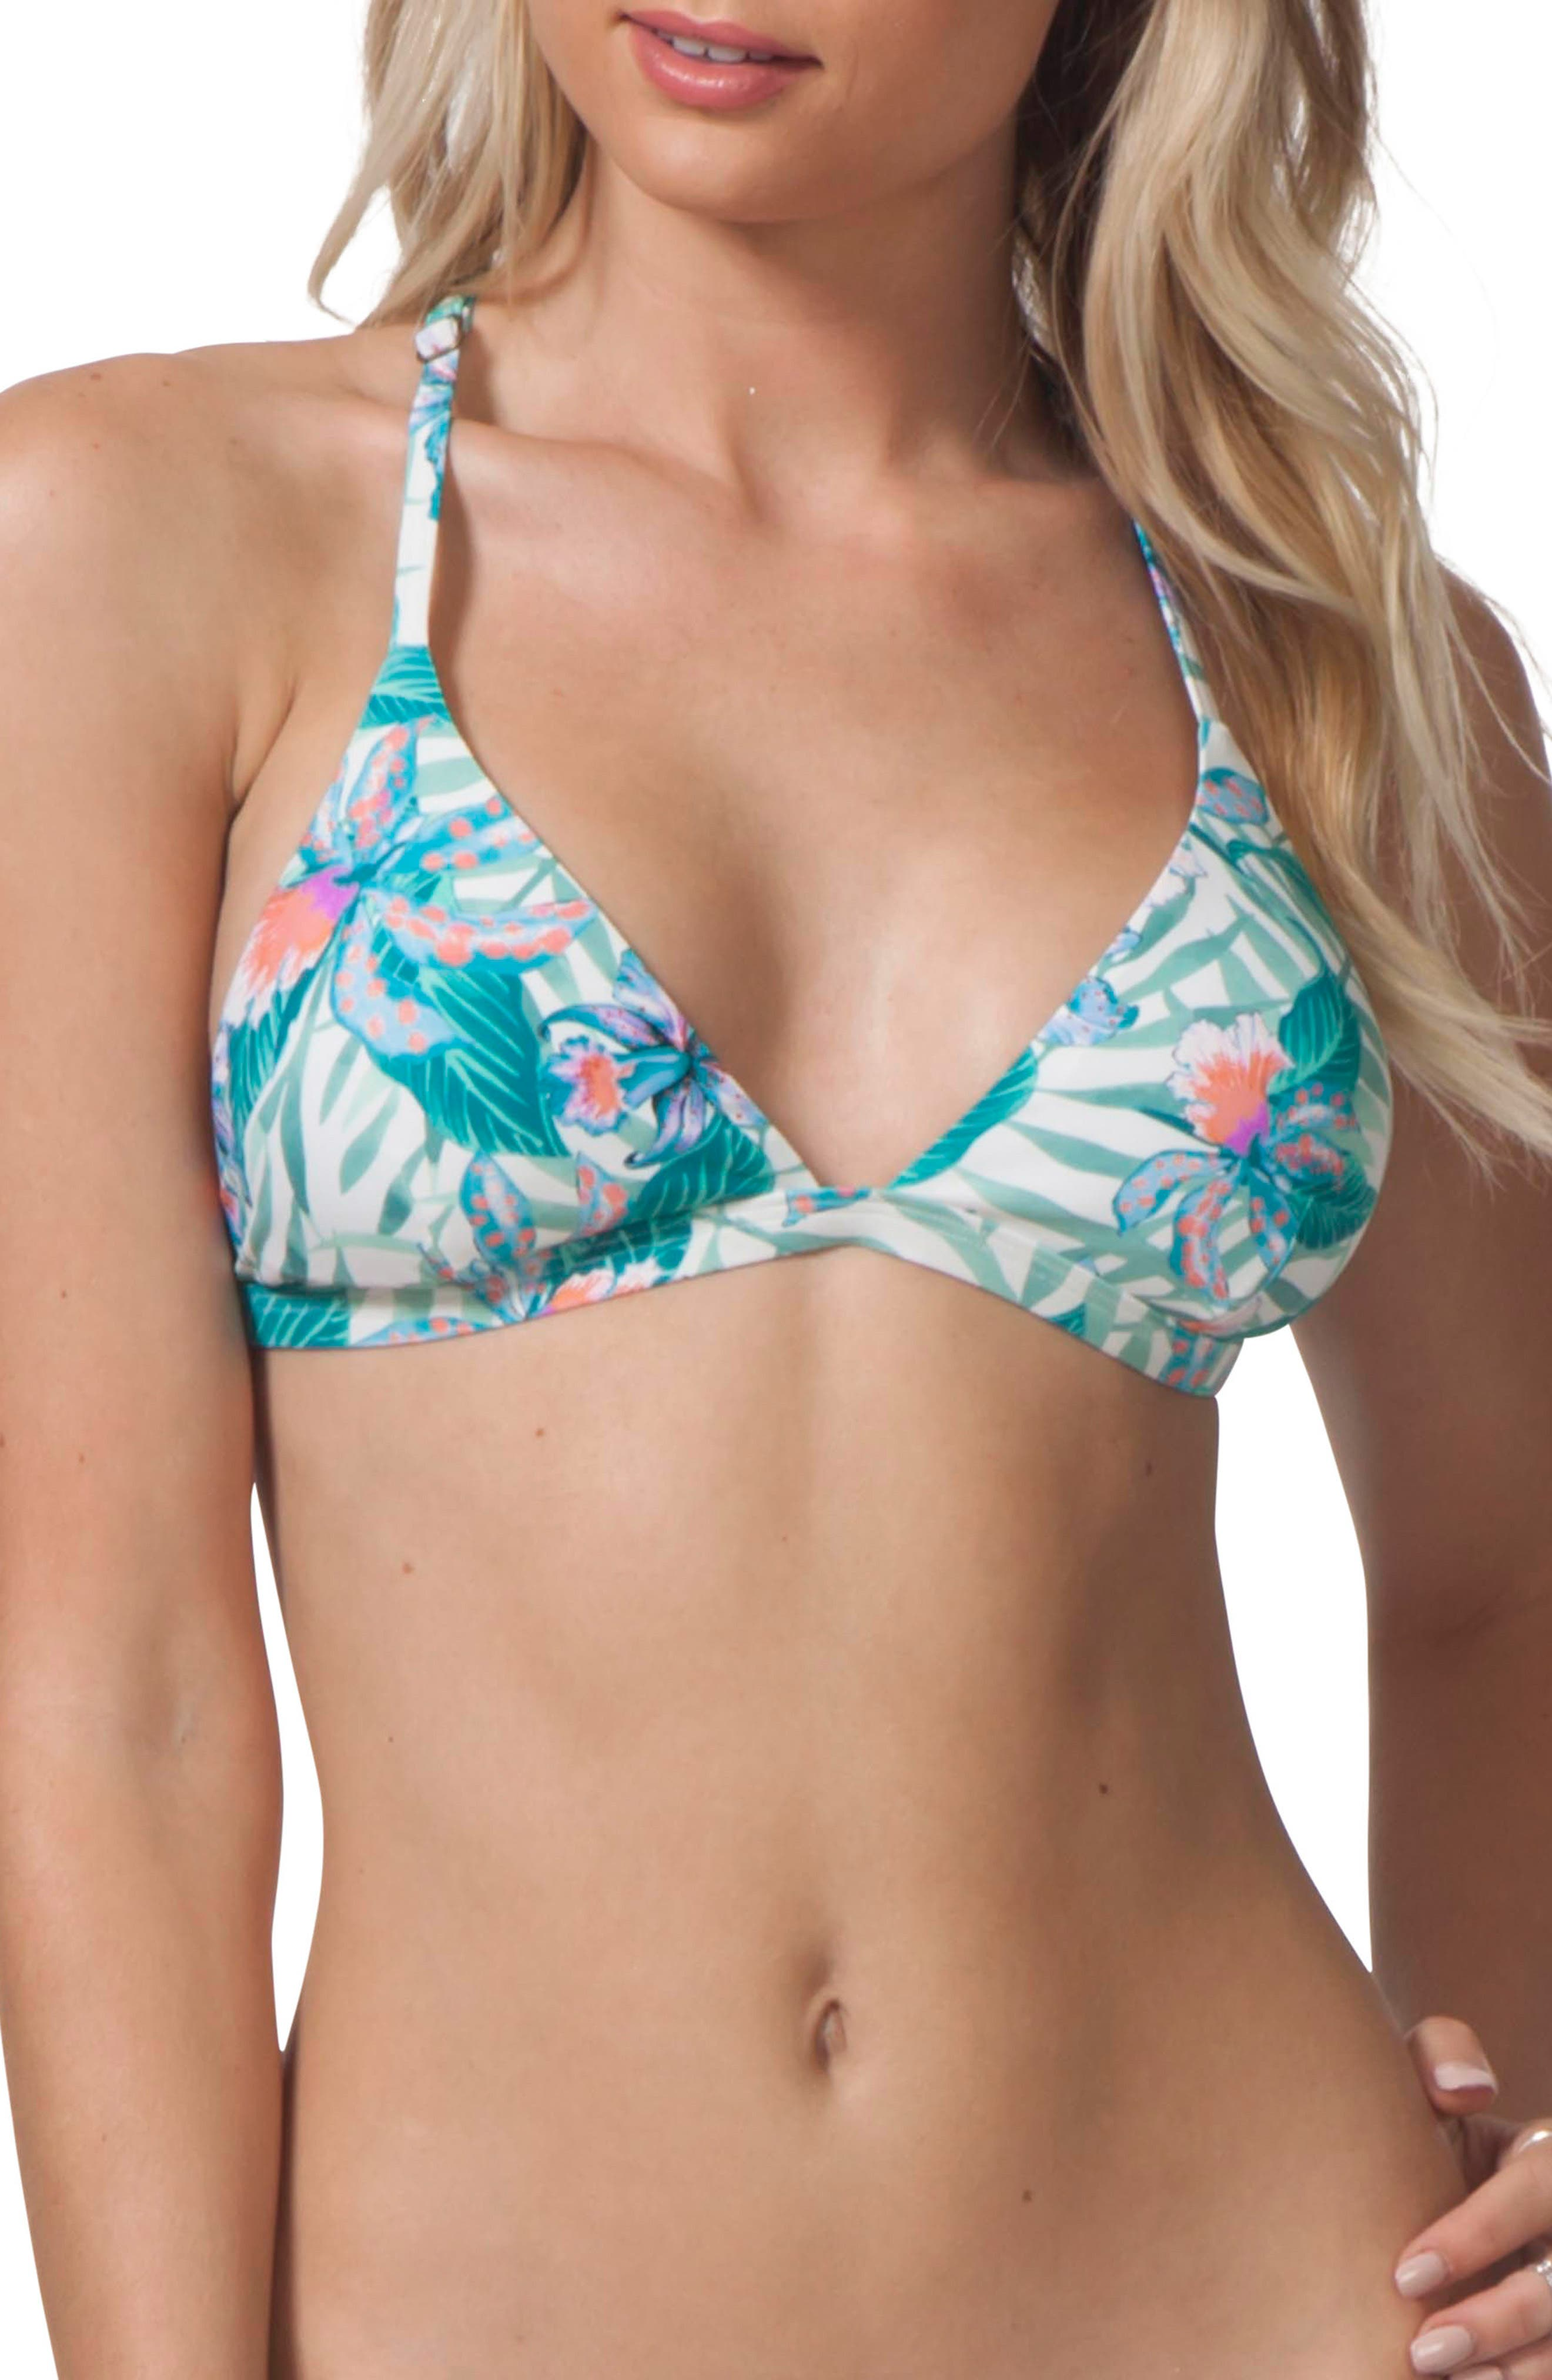 Tropic Tribe Triangle Bikini Top,                             Main thumbnail 1, color,                             100